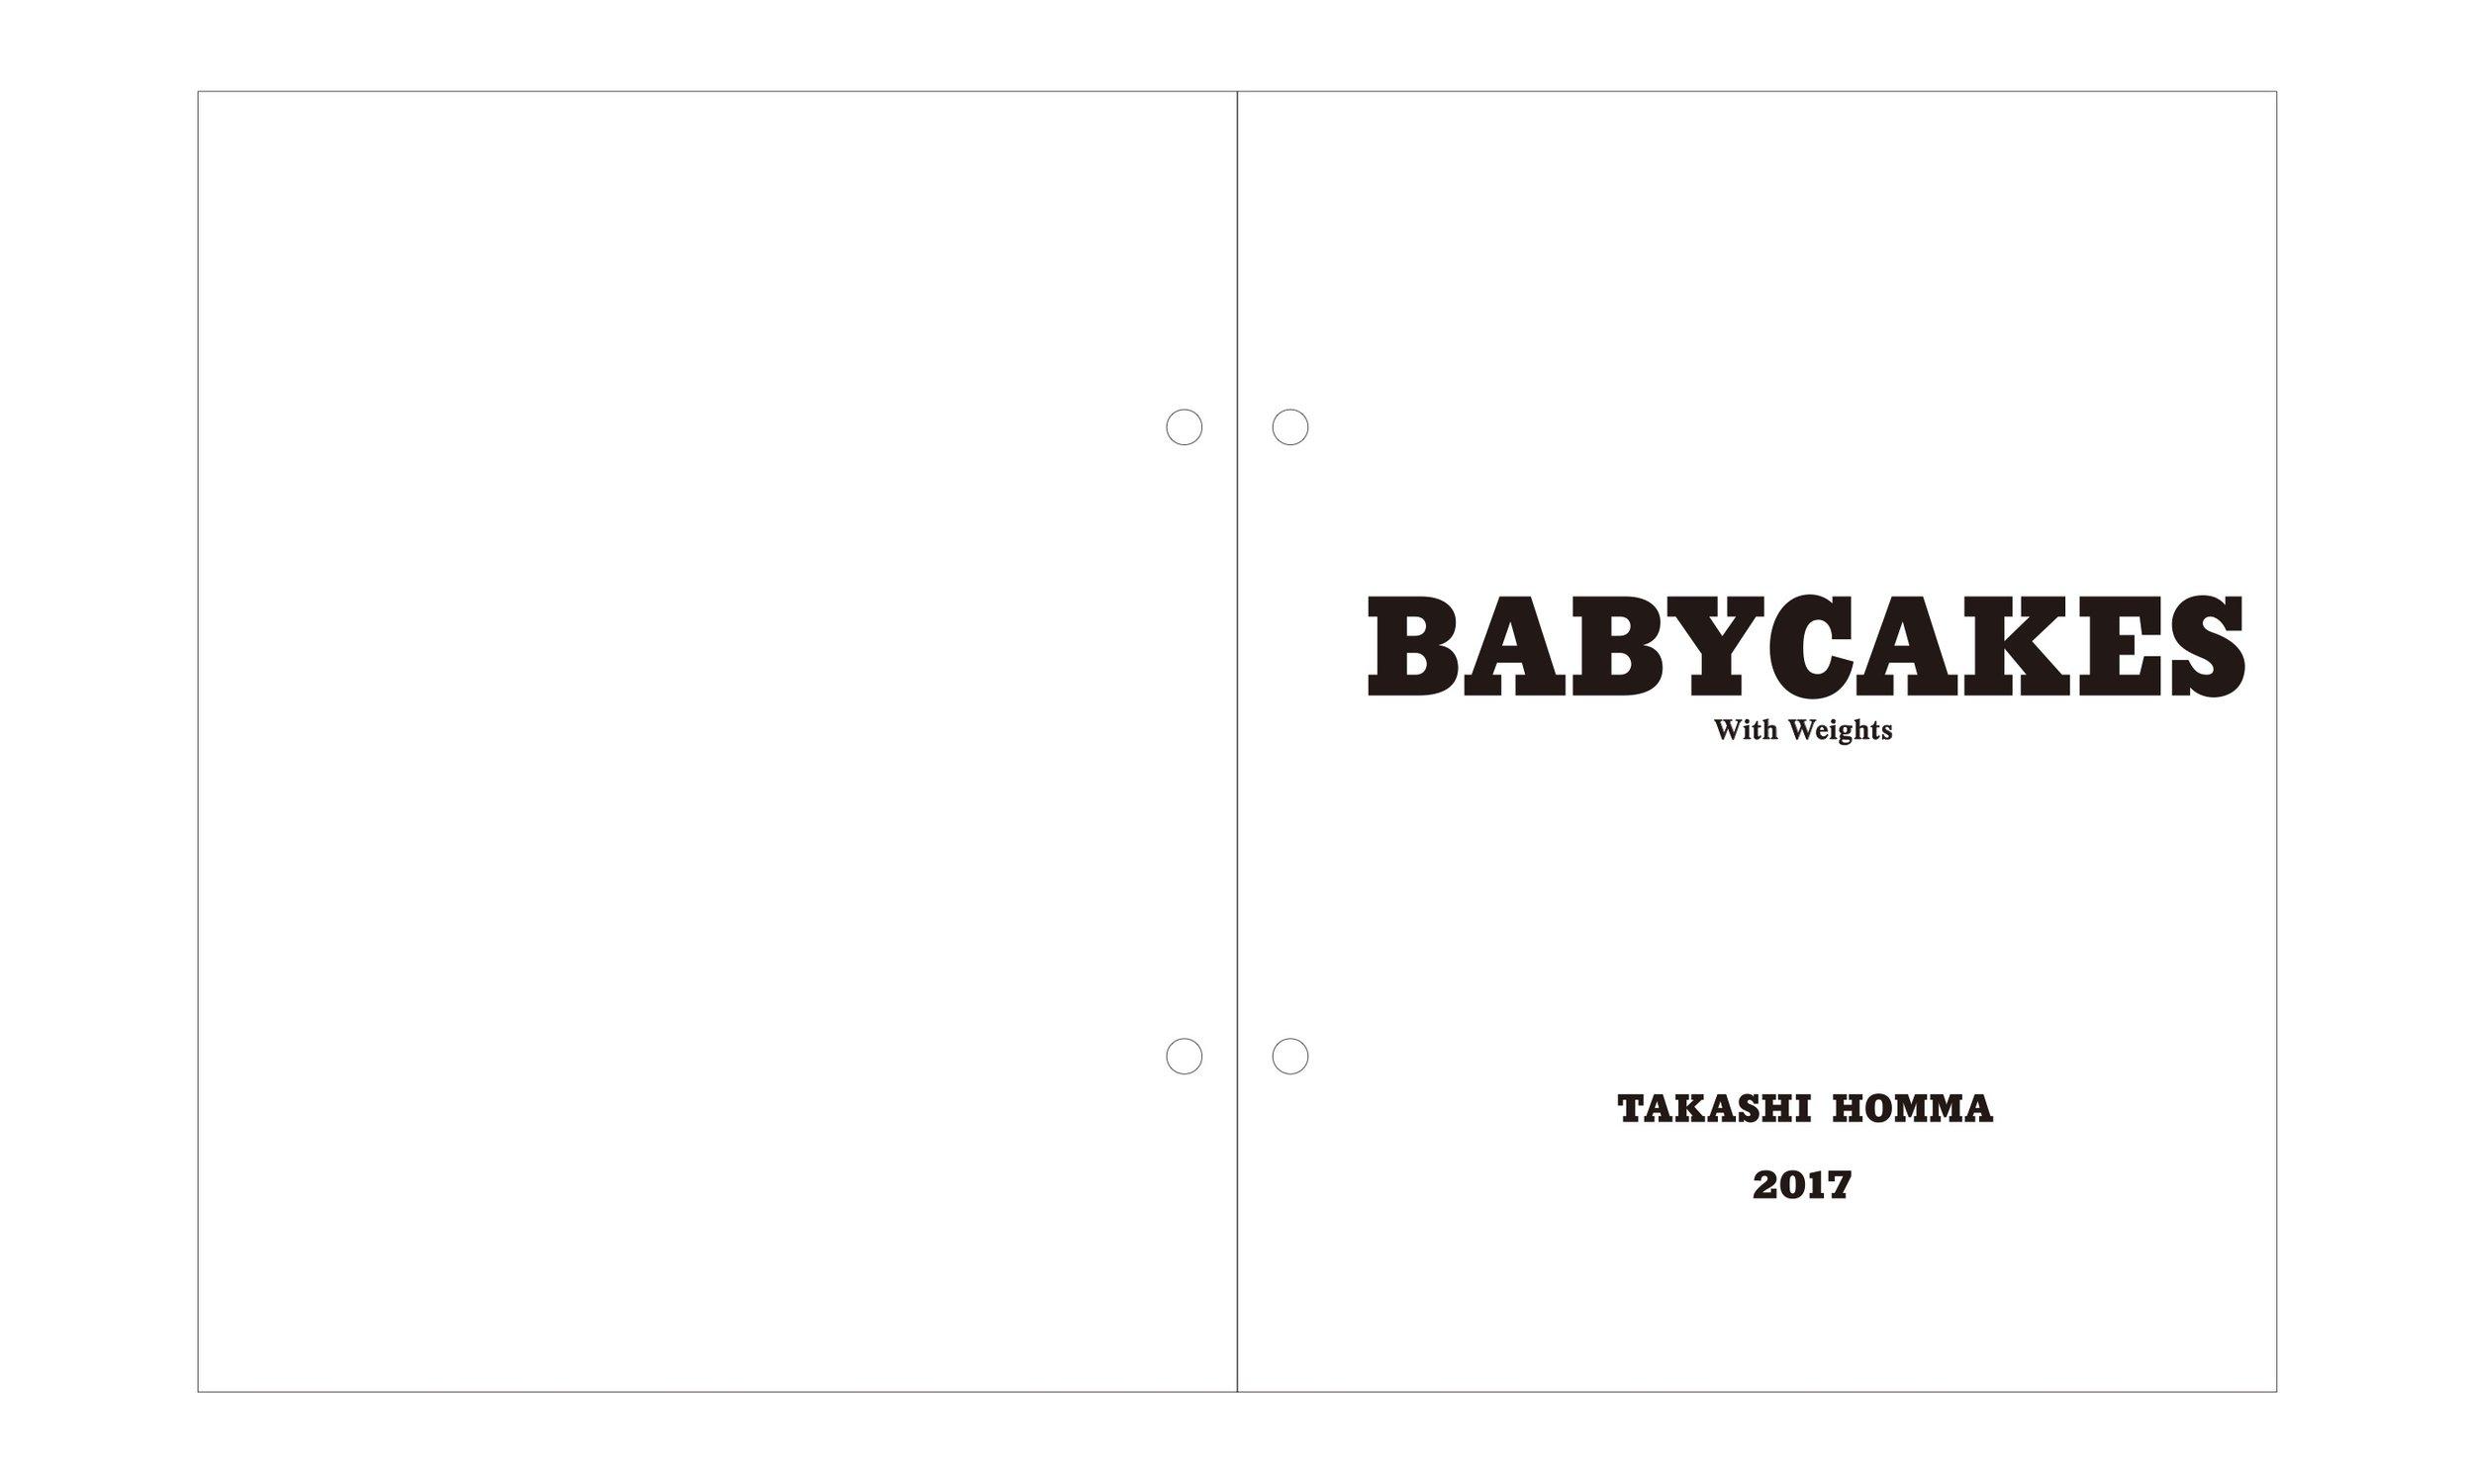 BABYCAKES_171204_S_2 3.jpeg